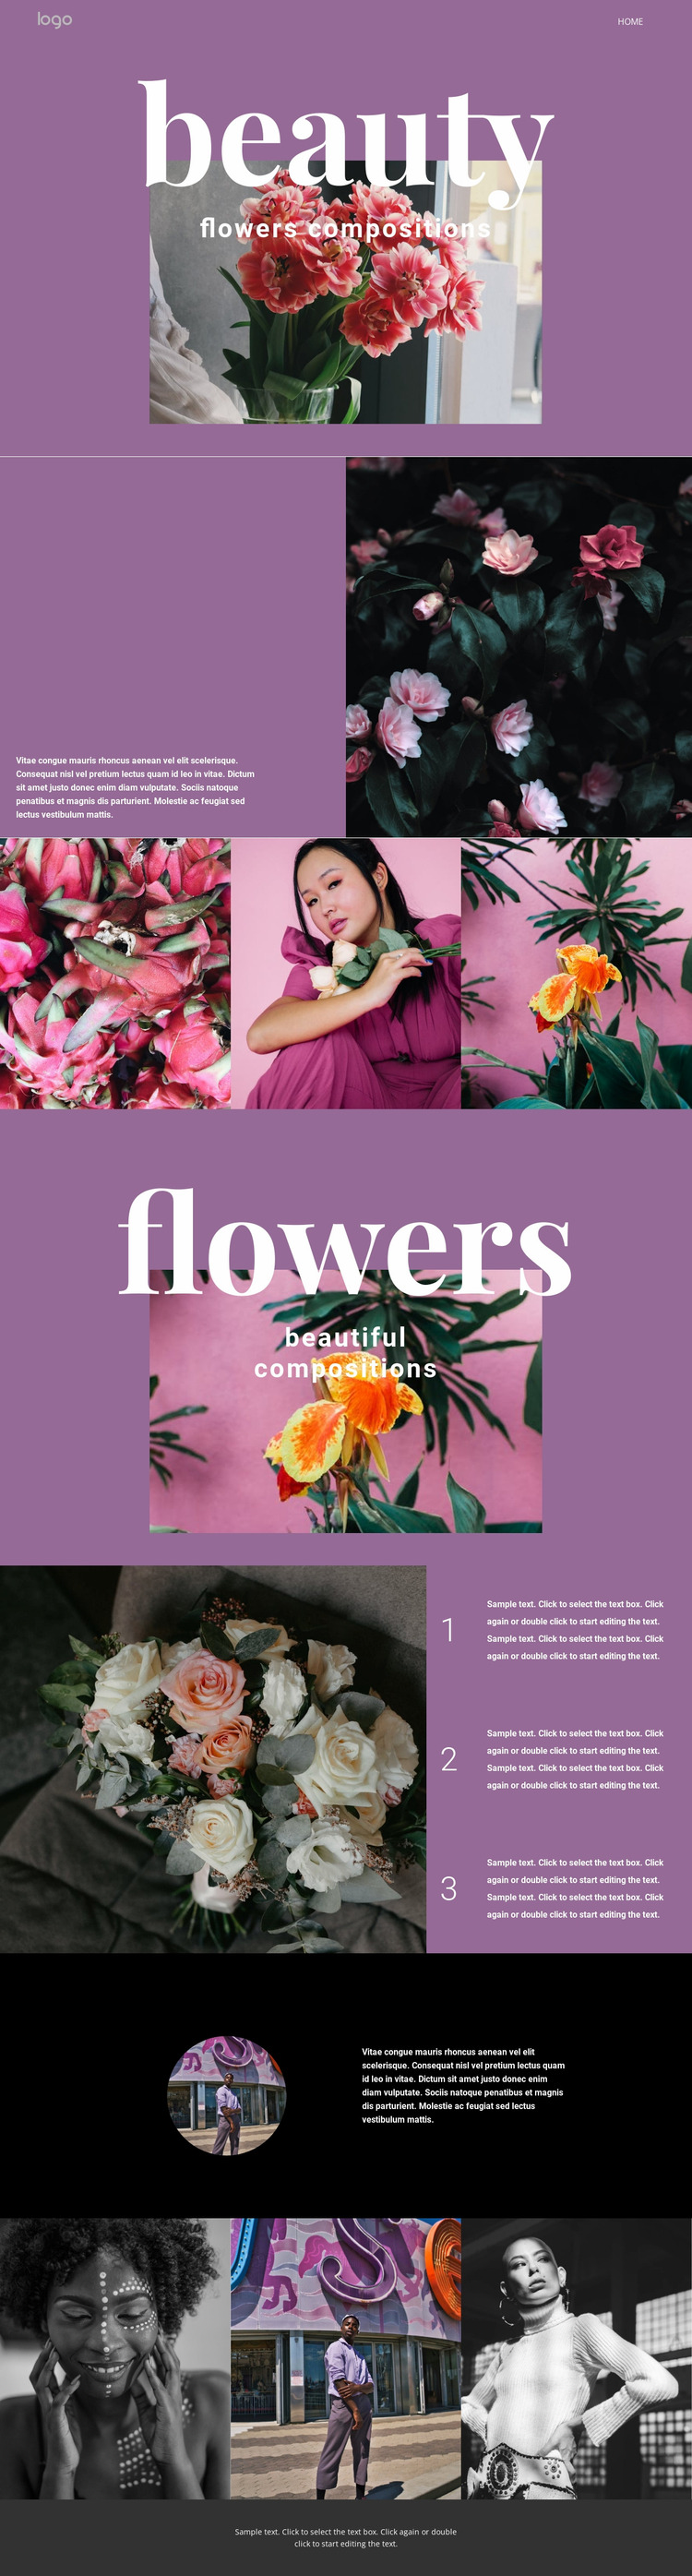 Flower salon Website Mockup